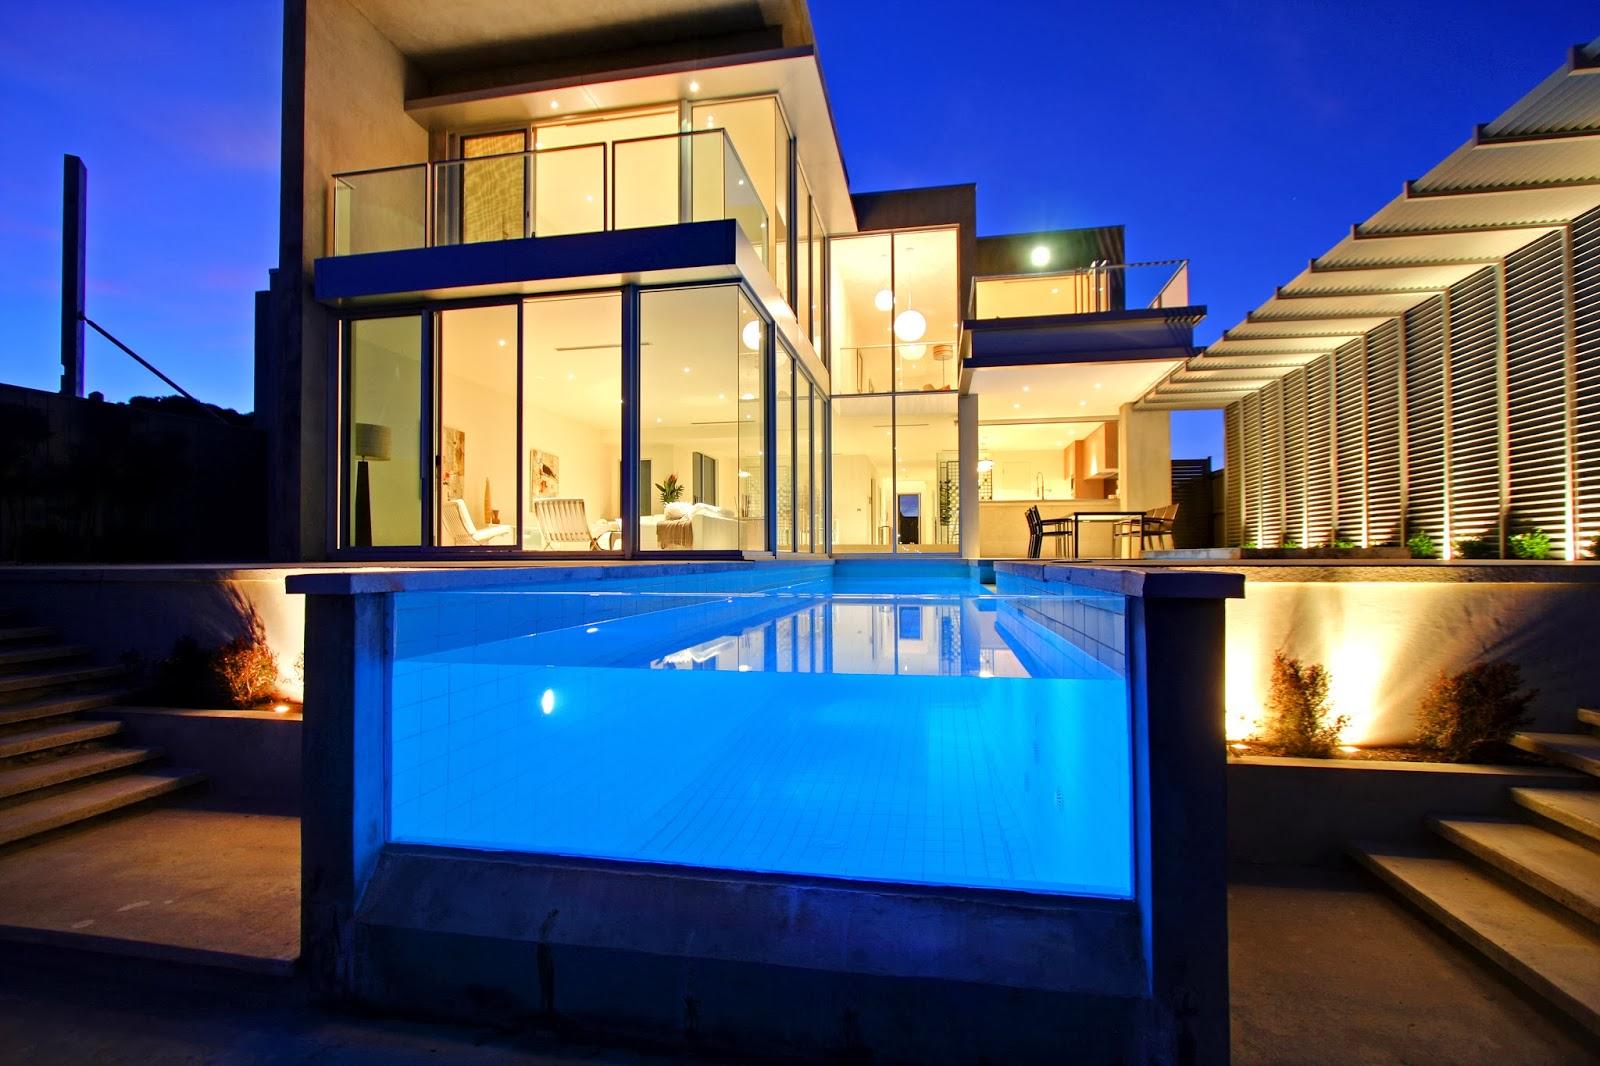 100+ [ My Dream Home Interior Design ] | Interior Design My Dream ...